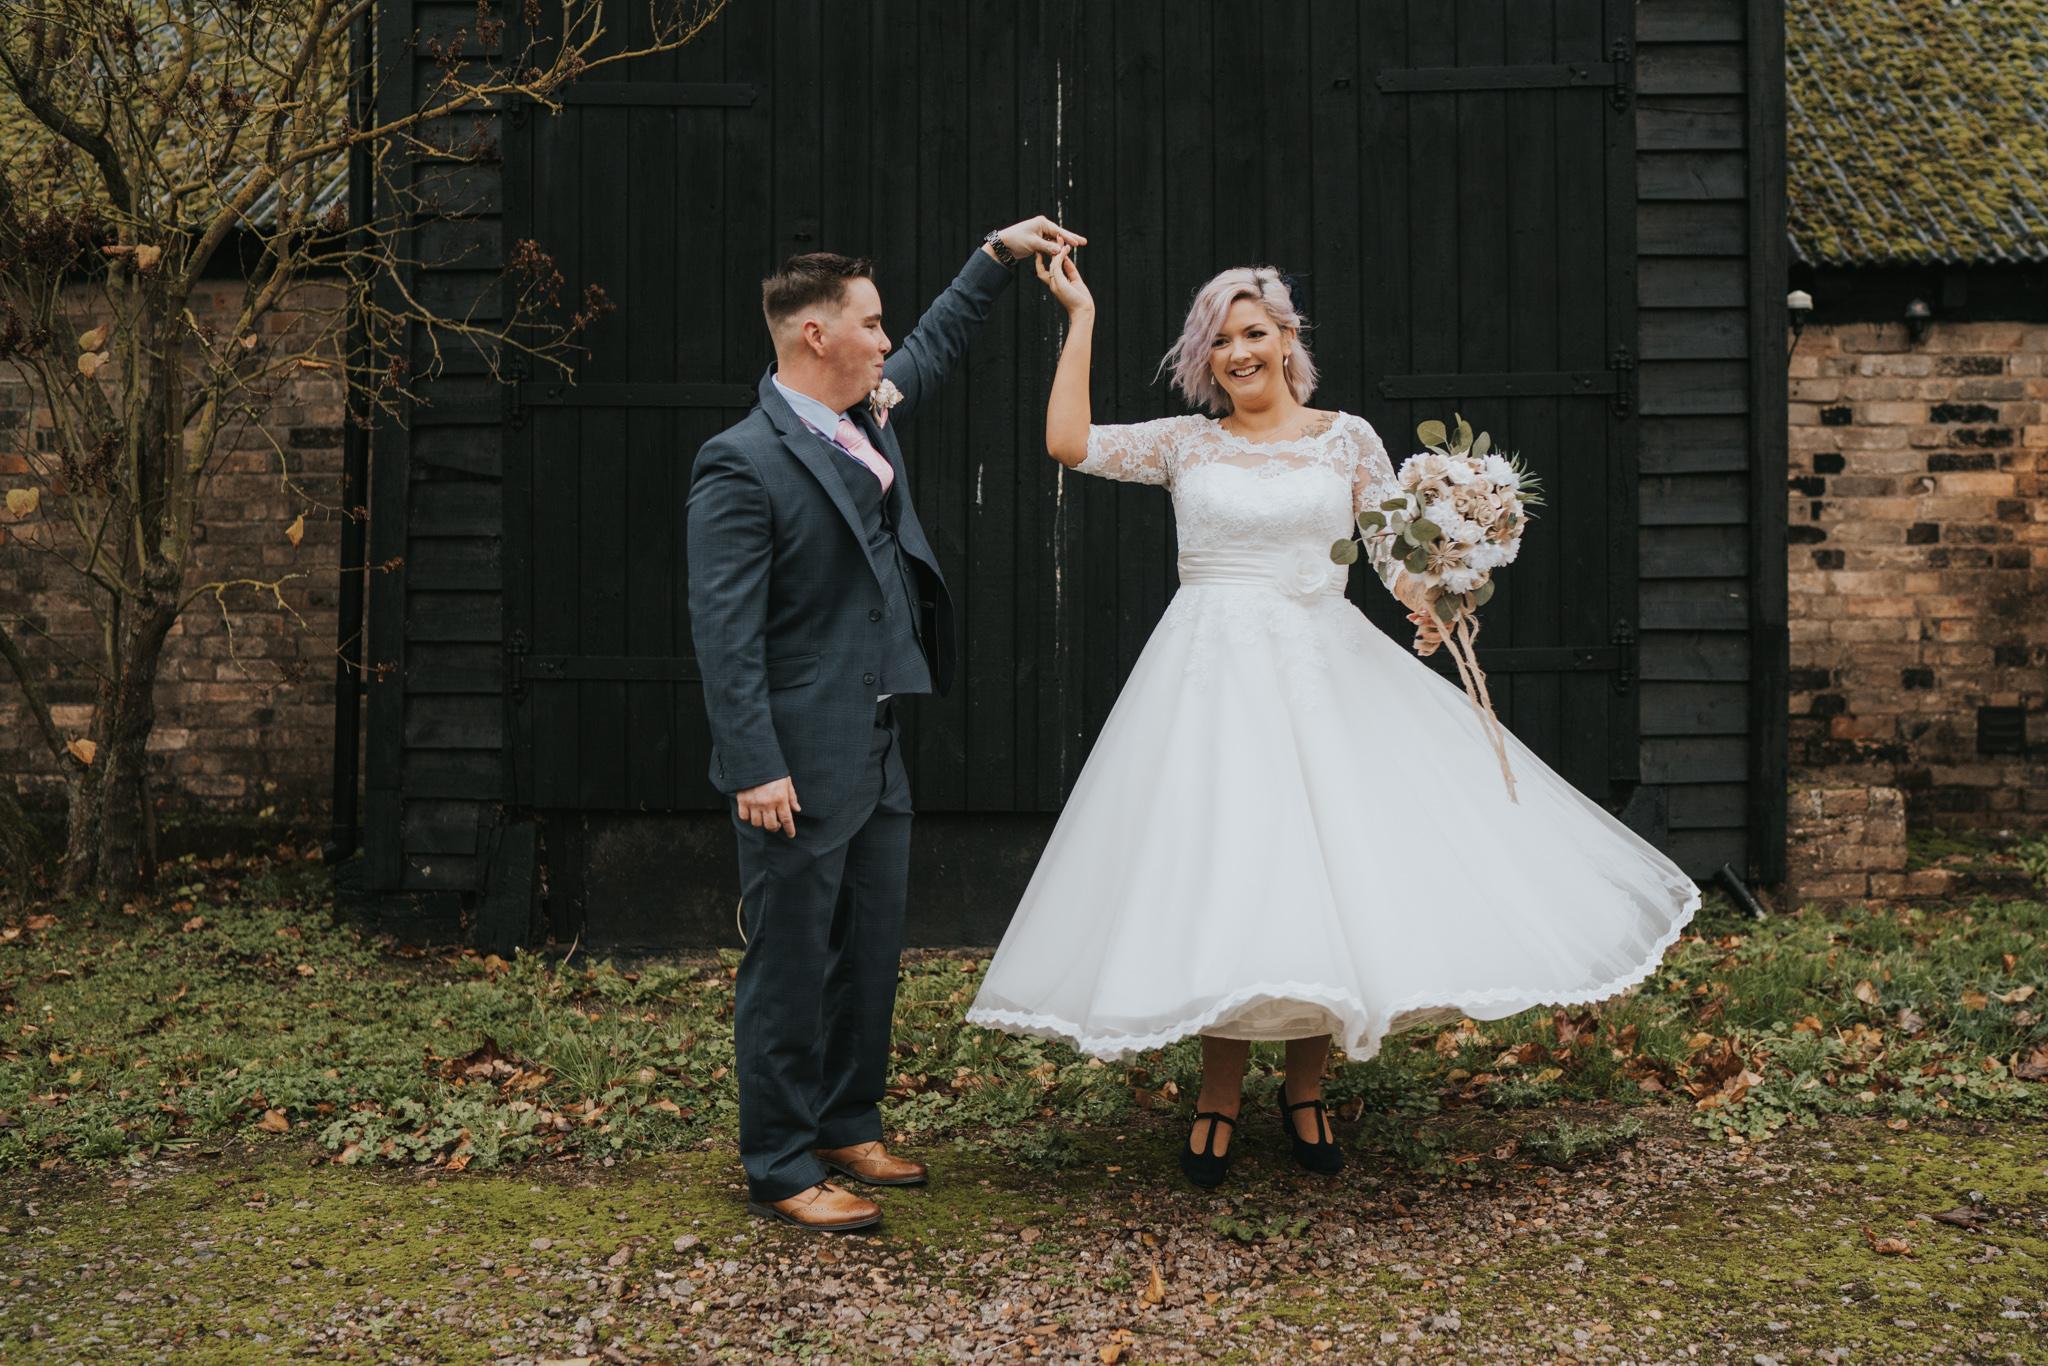 rhia-james-rustic-crabbs-barn-vintage-50s-retro-wedding-grace-elizabeth-colchester-essex-alternative-relaxed-wedding-family-photography-devon-suffolk-norfolk-essex (85 of 138).jpg